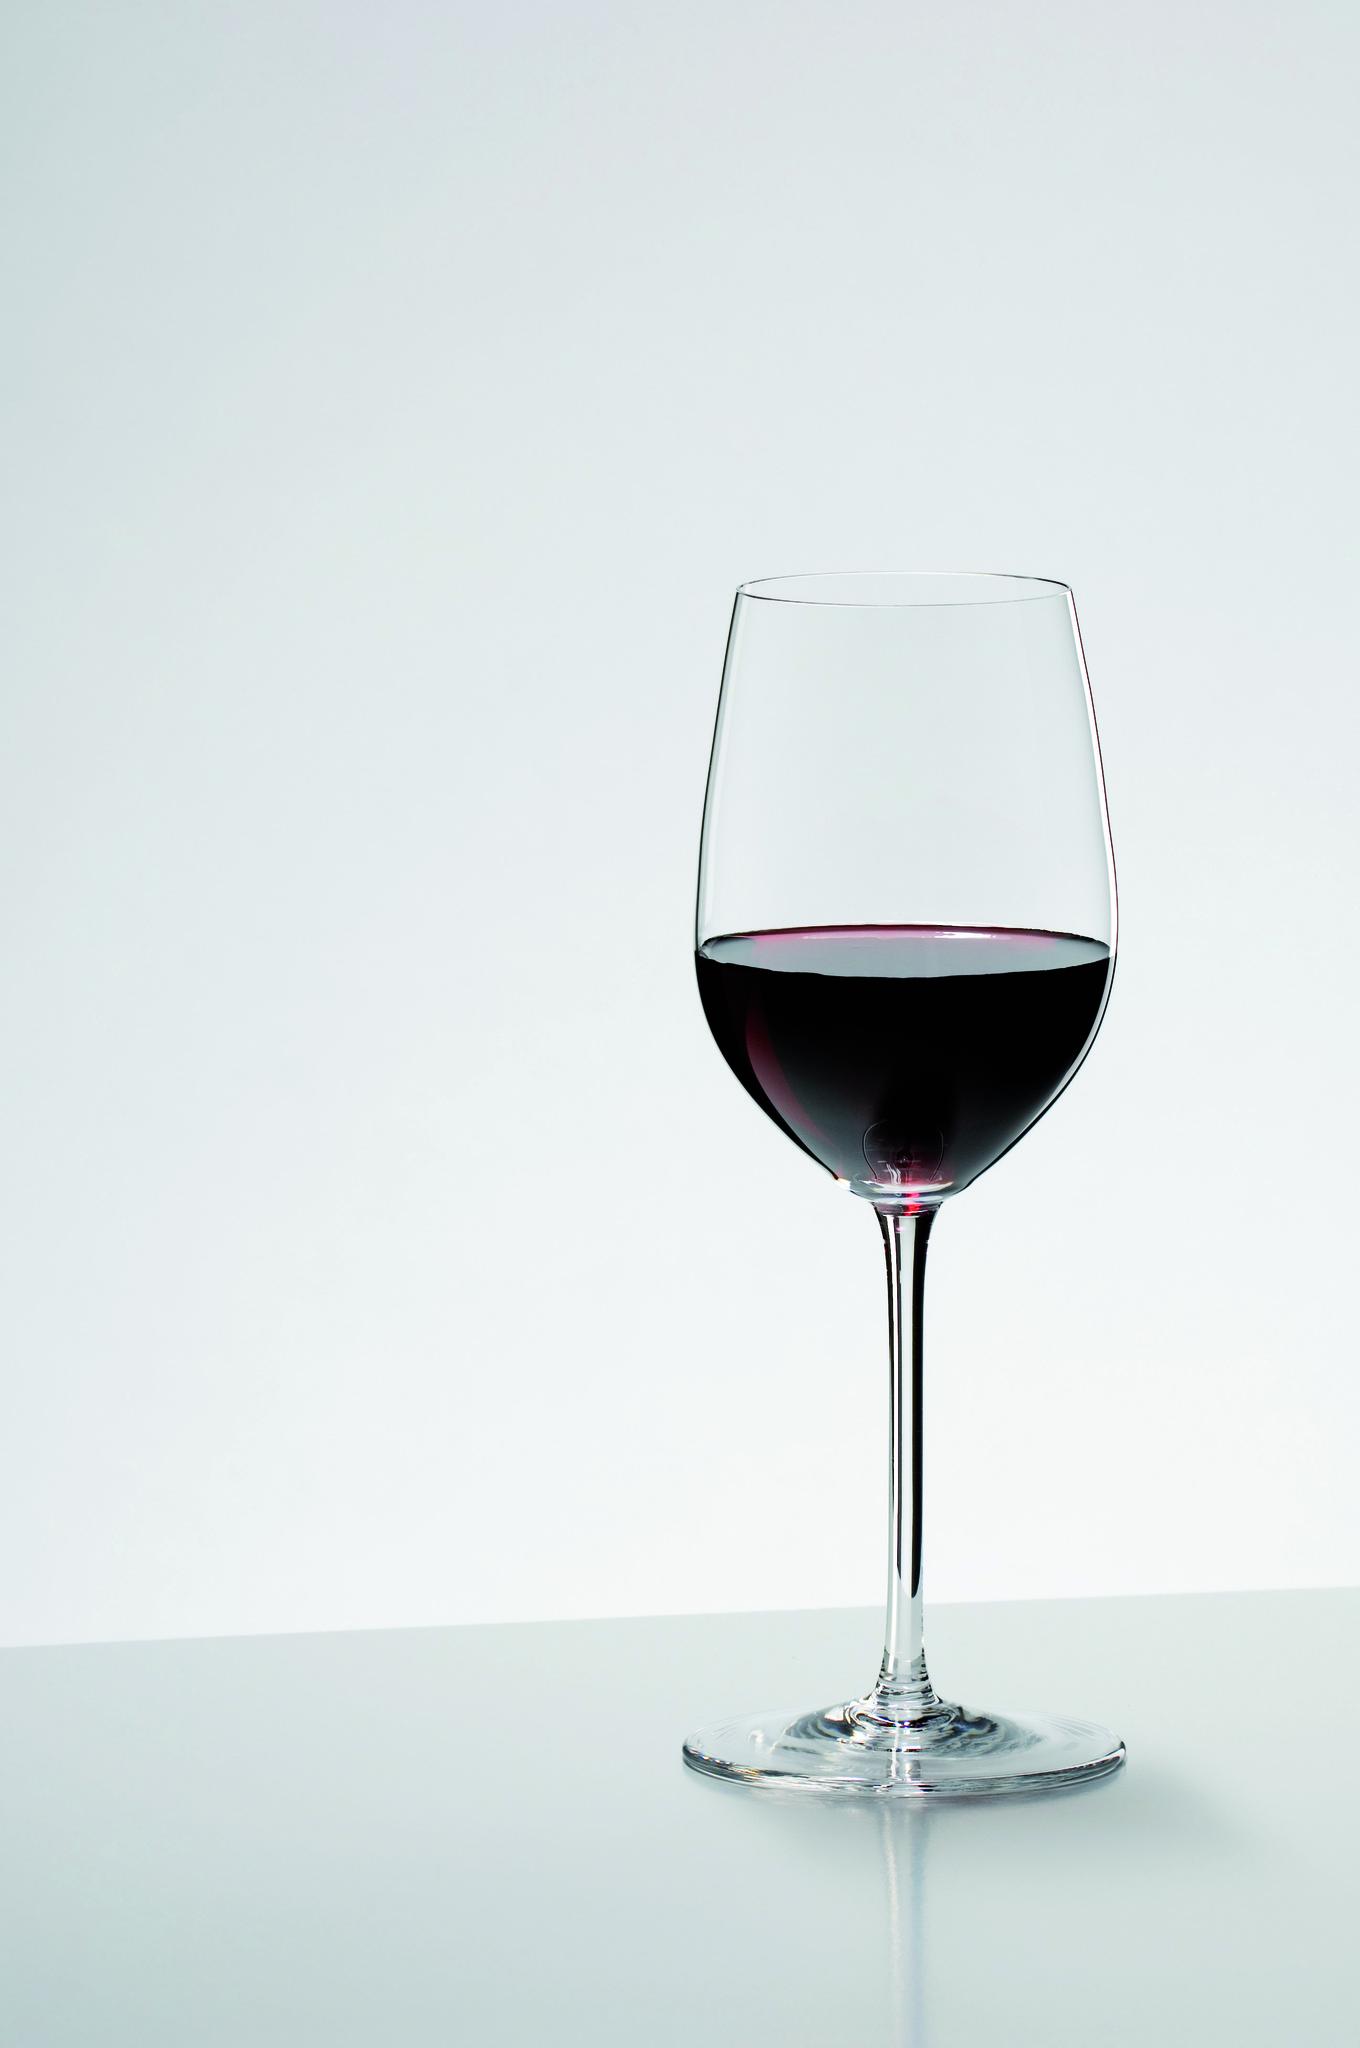 Бокалы Бокал для красного вина 350мл Riedel Sommeliers Bordeaux Mature bokal-dlya-vina-350-ml-riedel-bordeaux-maturechablis-avstriya.jpg